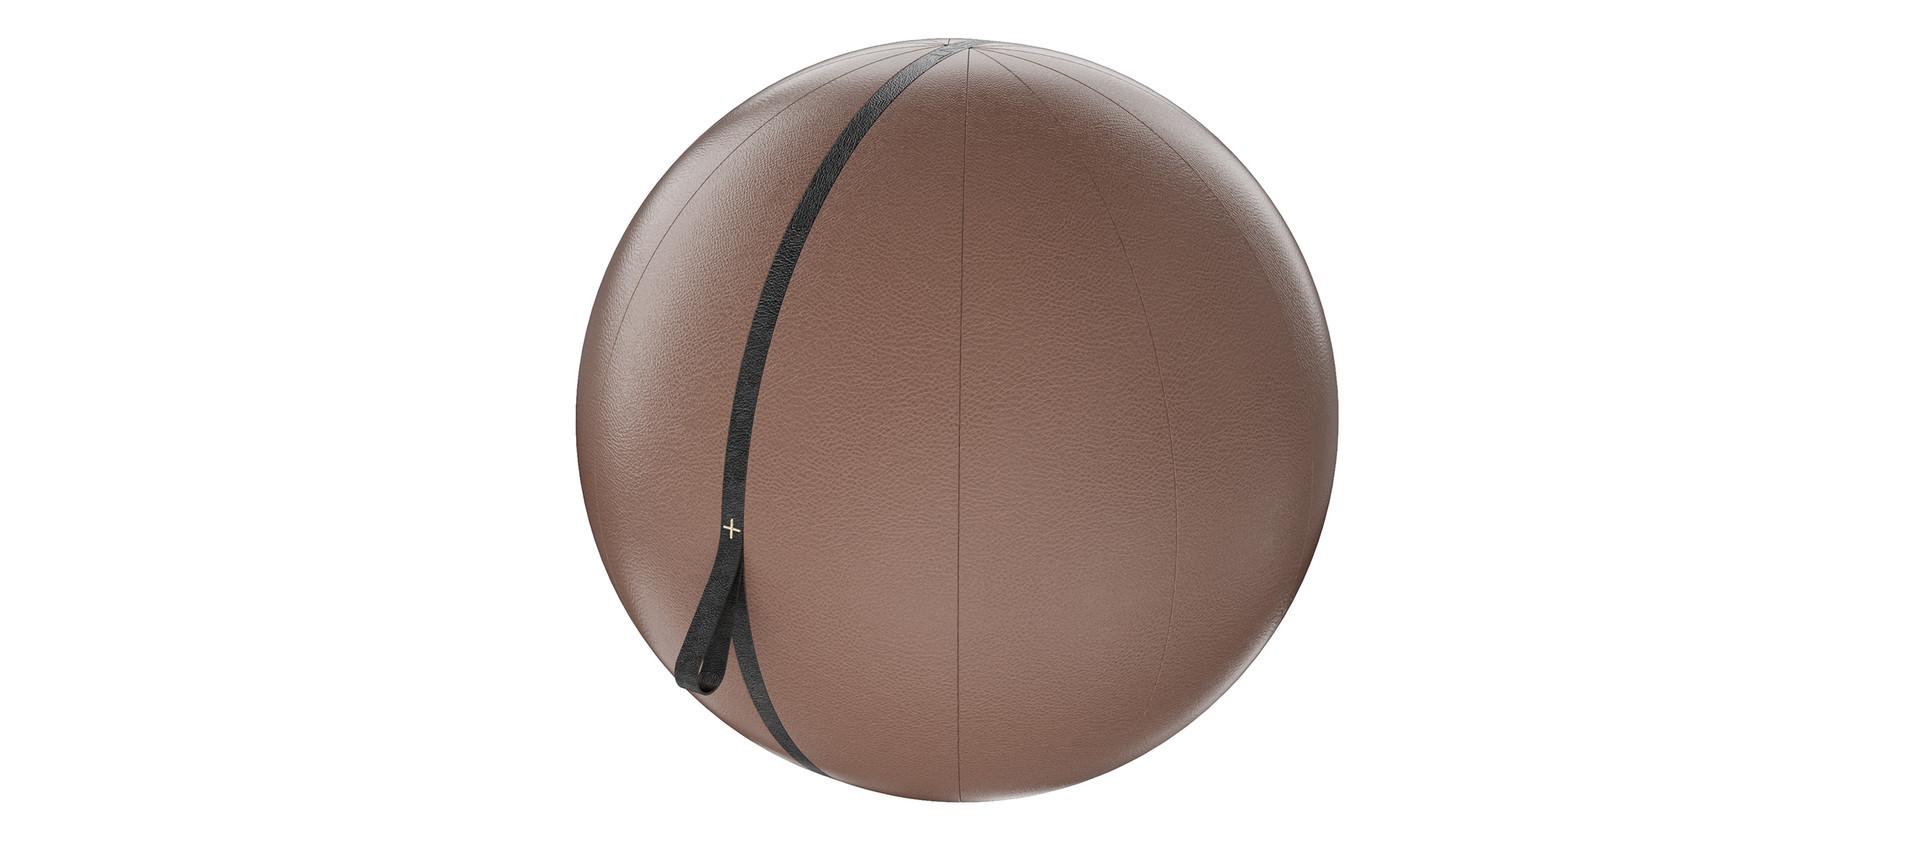 MESNA luxury leather gym ball.jpg